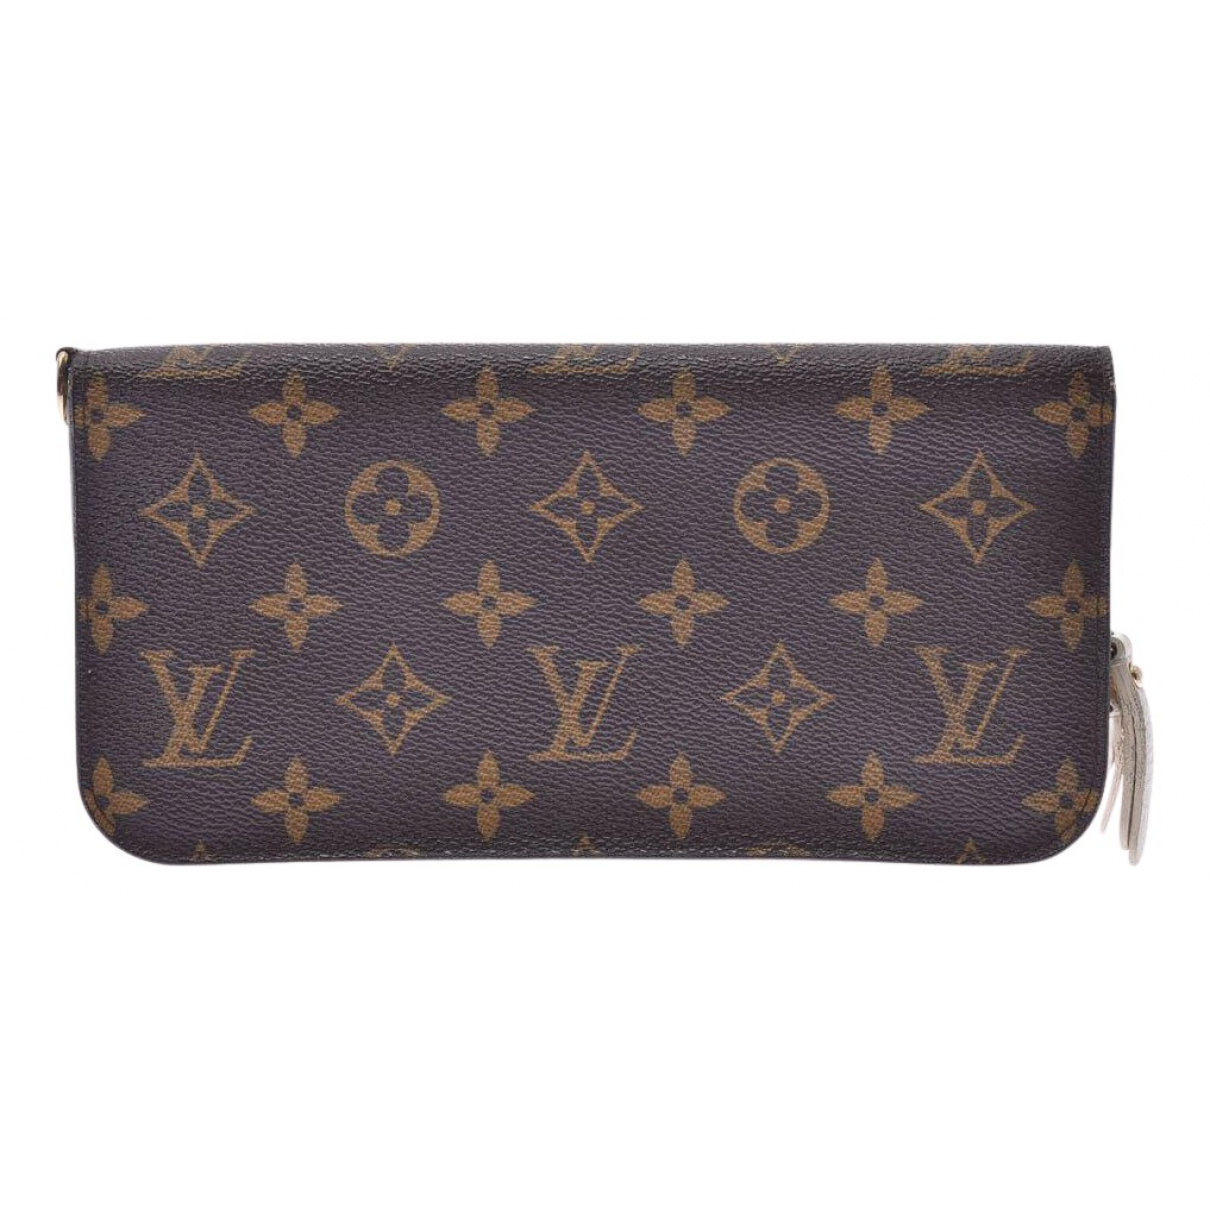 Cartera Insolite de Lona Louis Vuitton